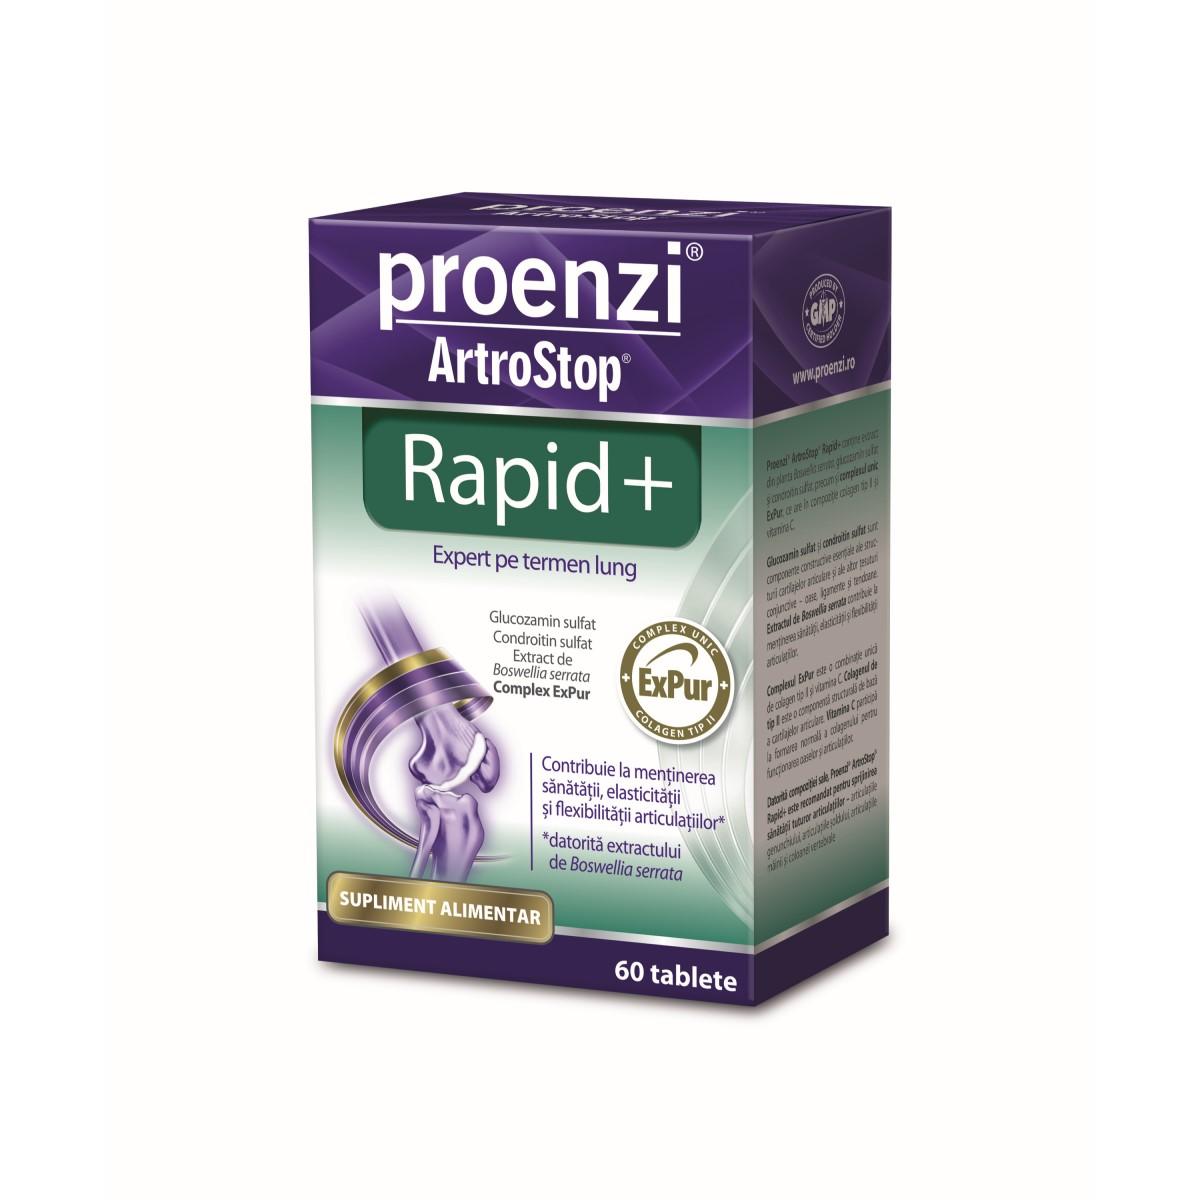 medicamente pe bază de plante articulare)